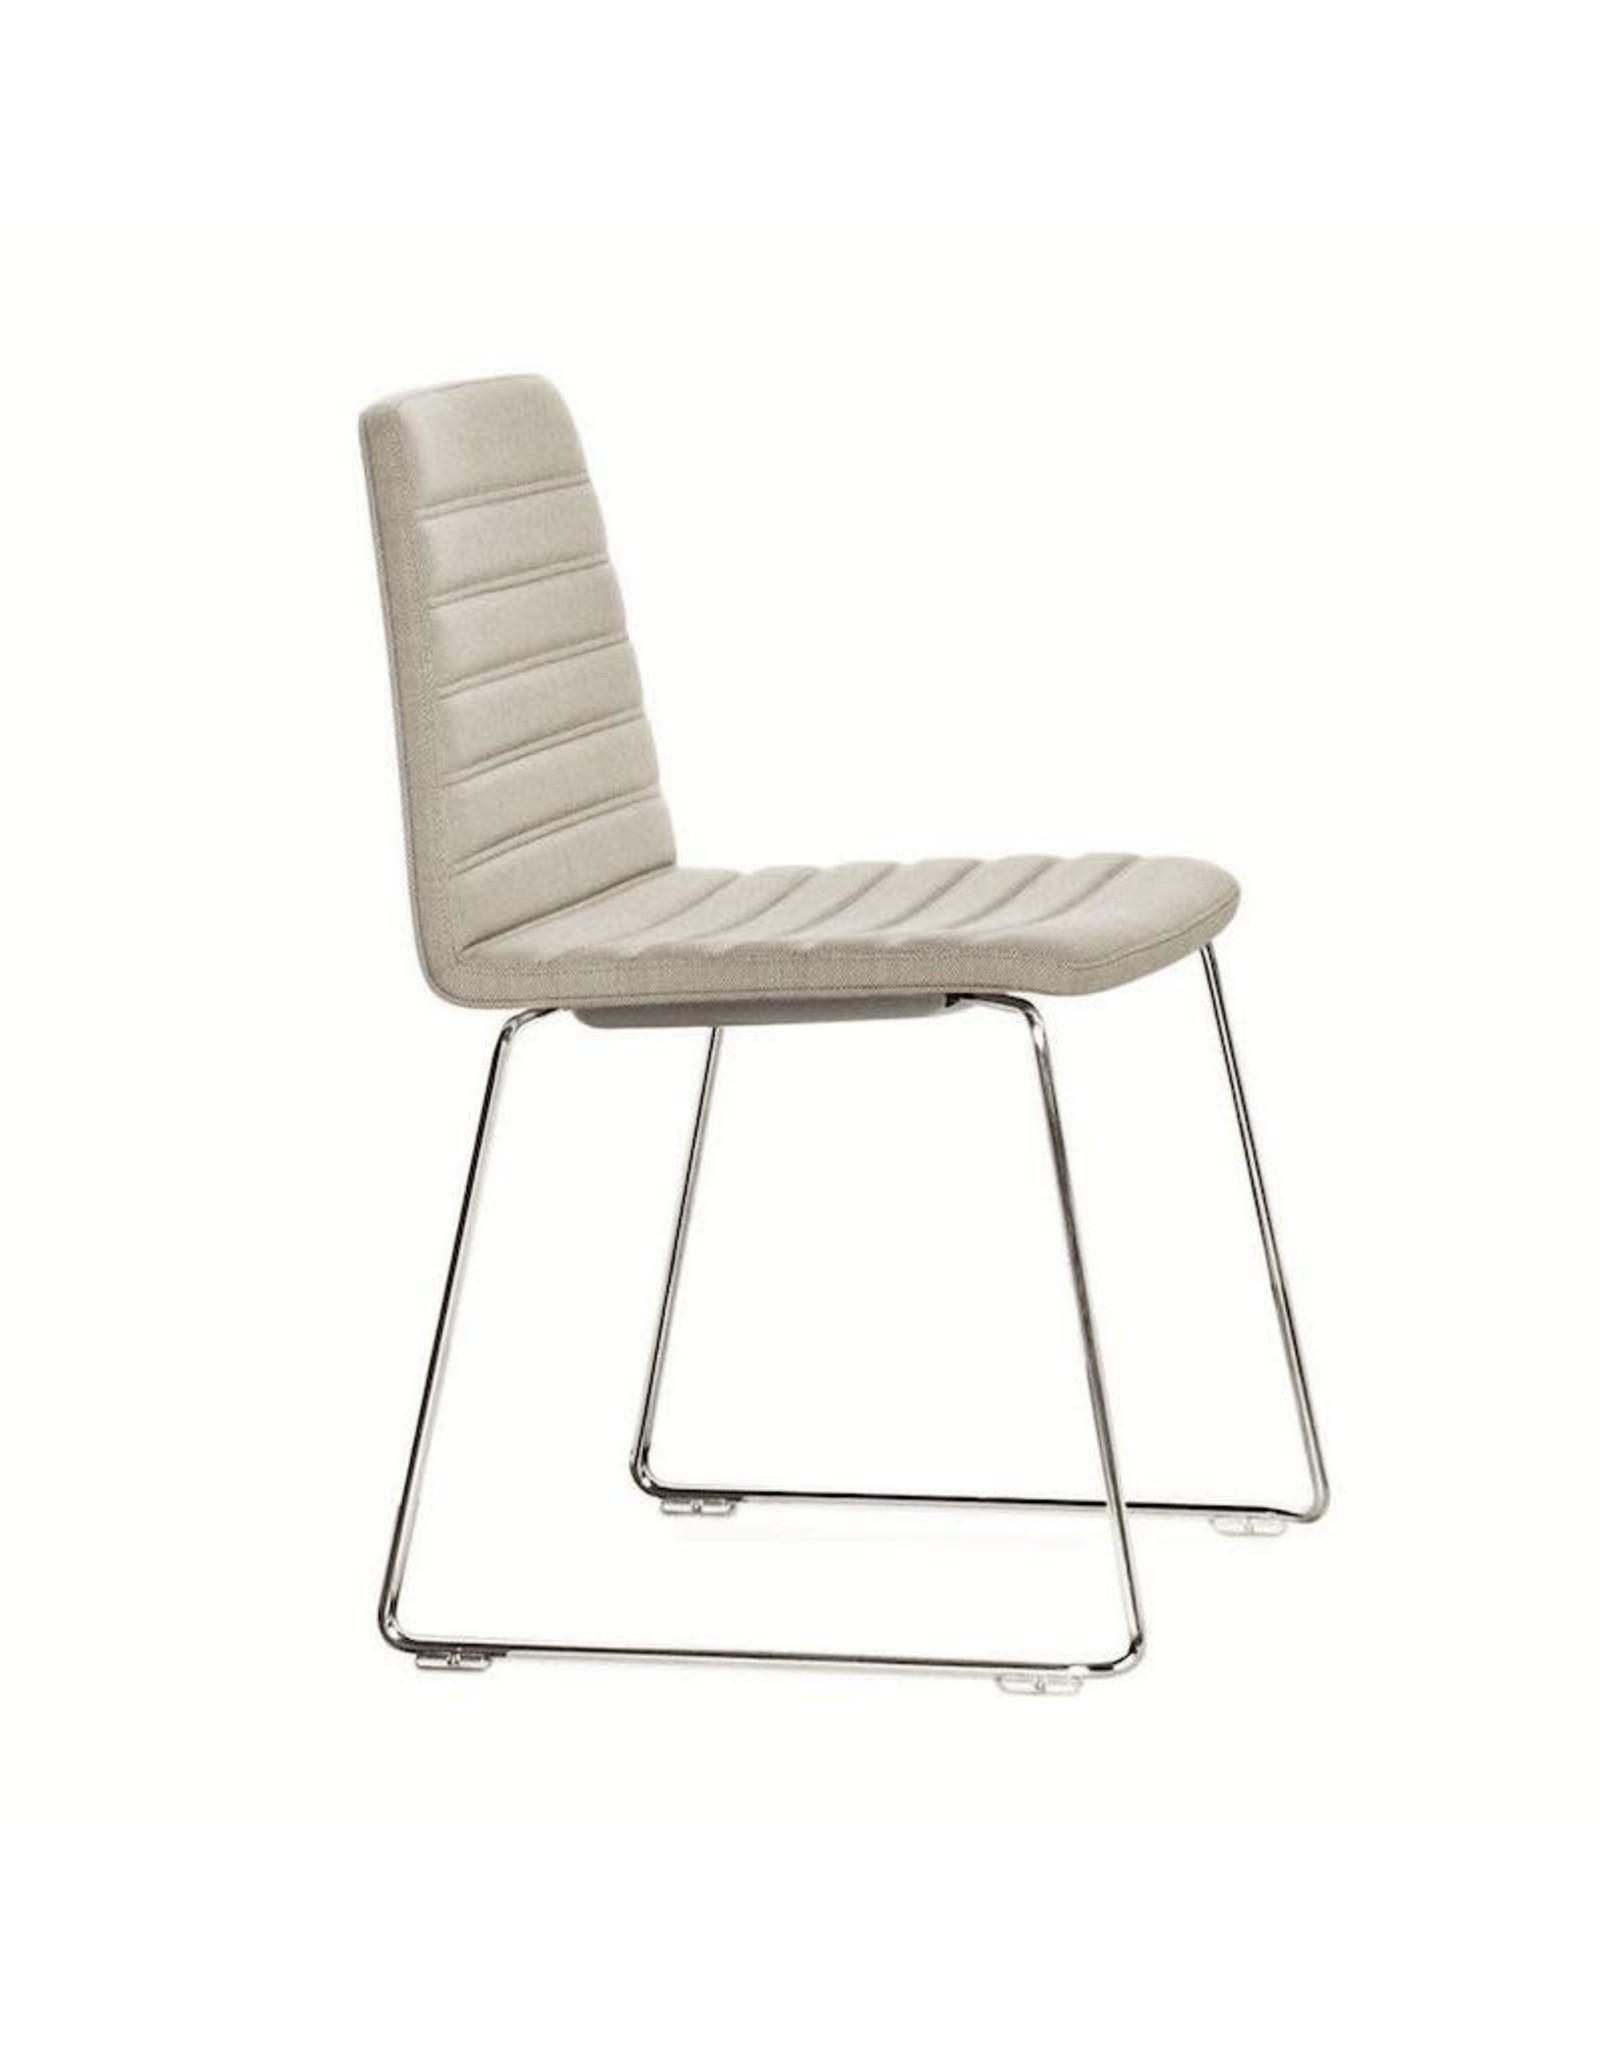 PAUSTIAN SPINAL CHAIR 44 可叠放镀铬椅子